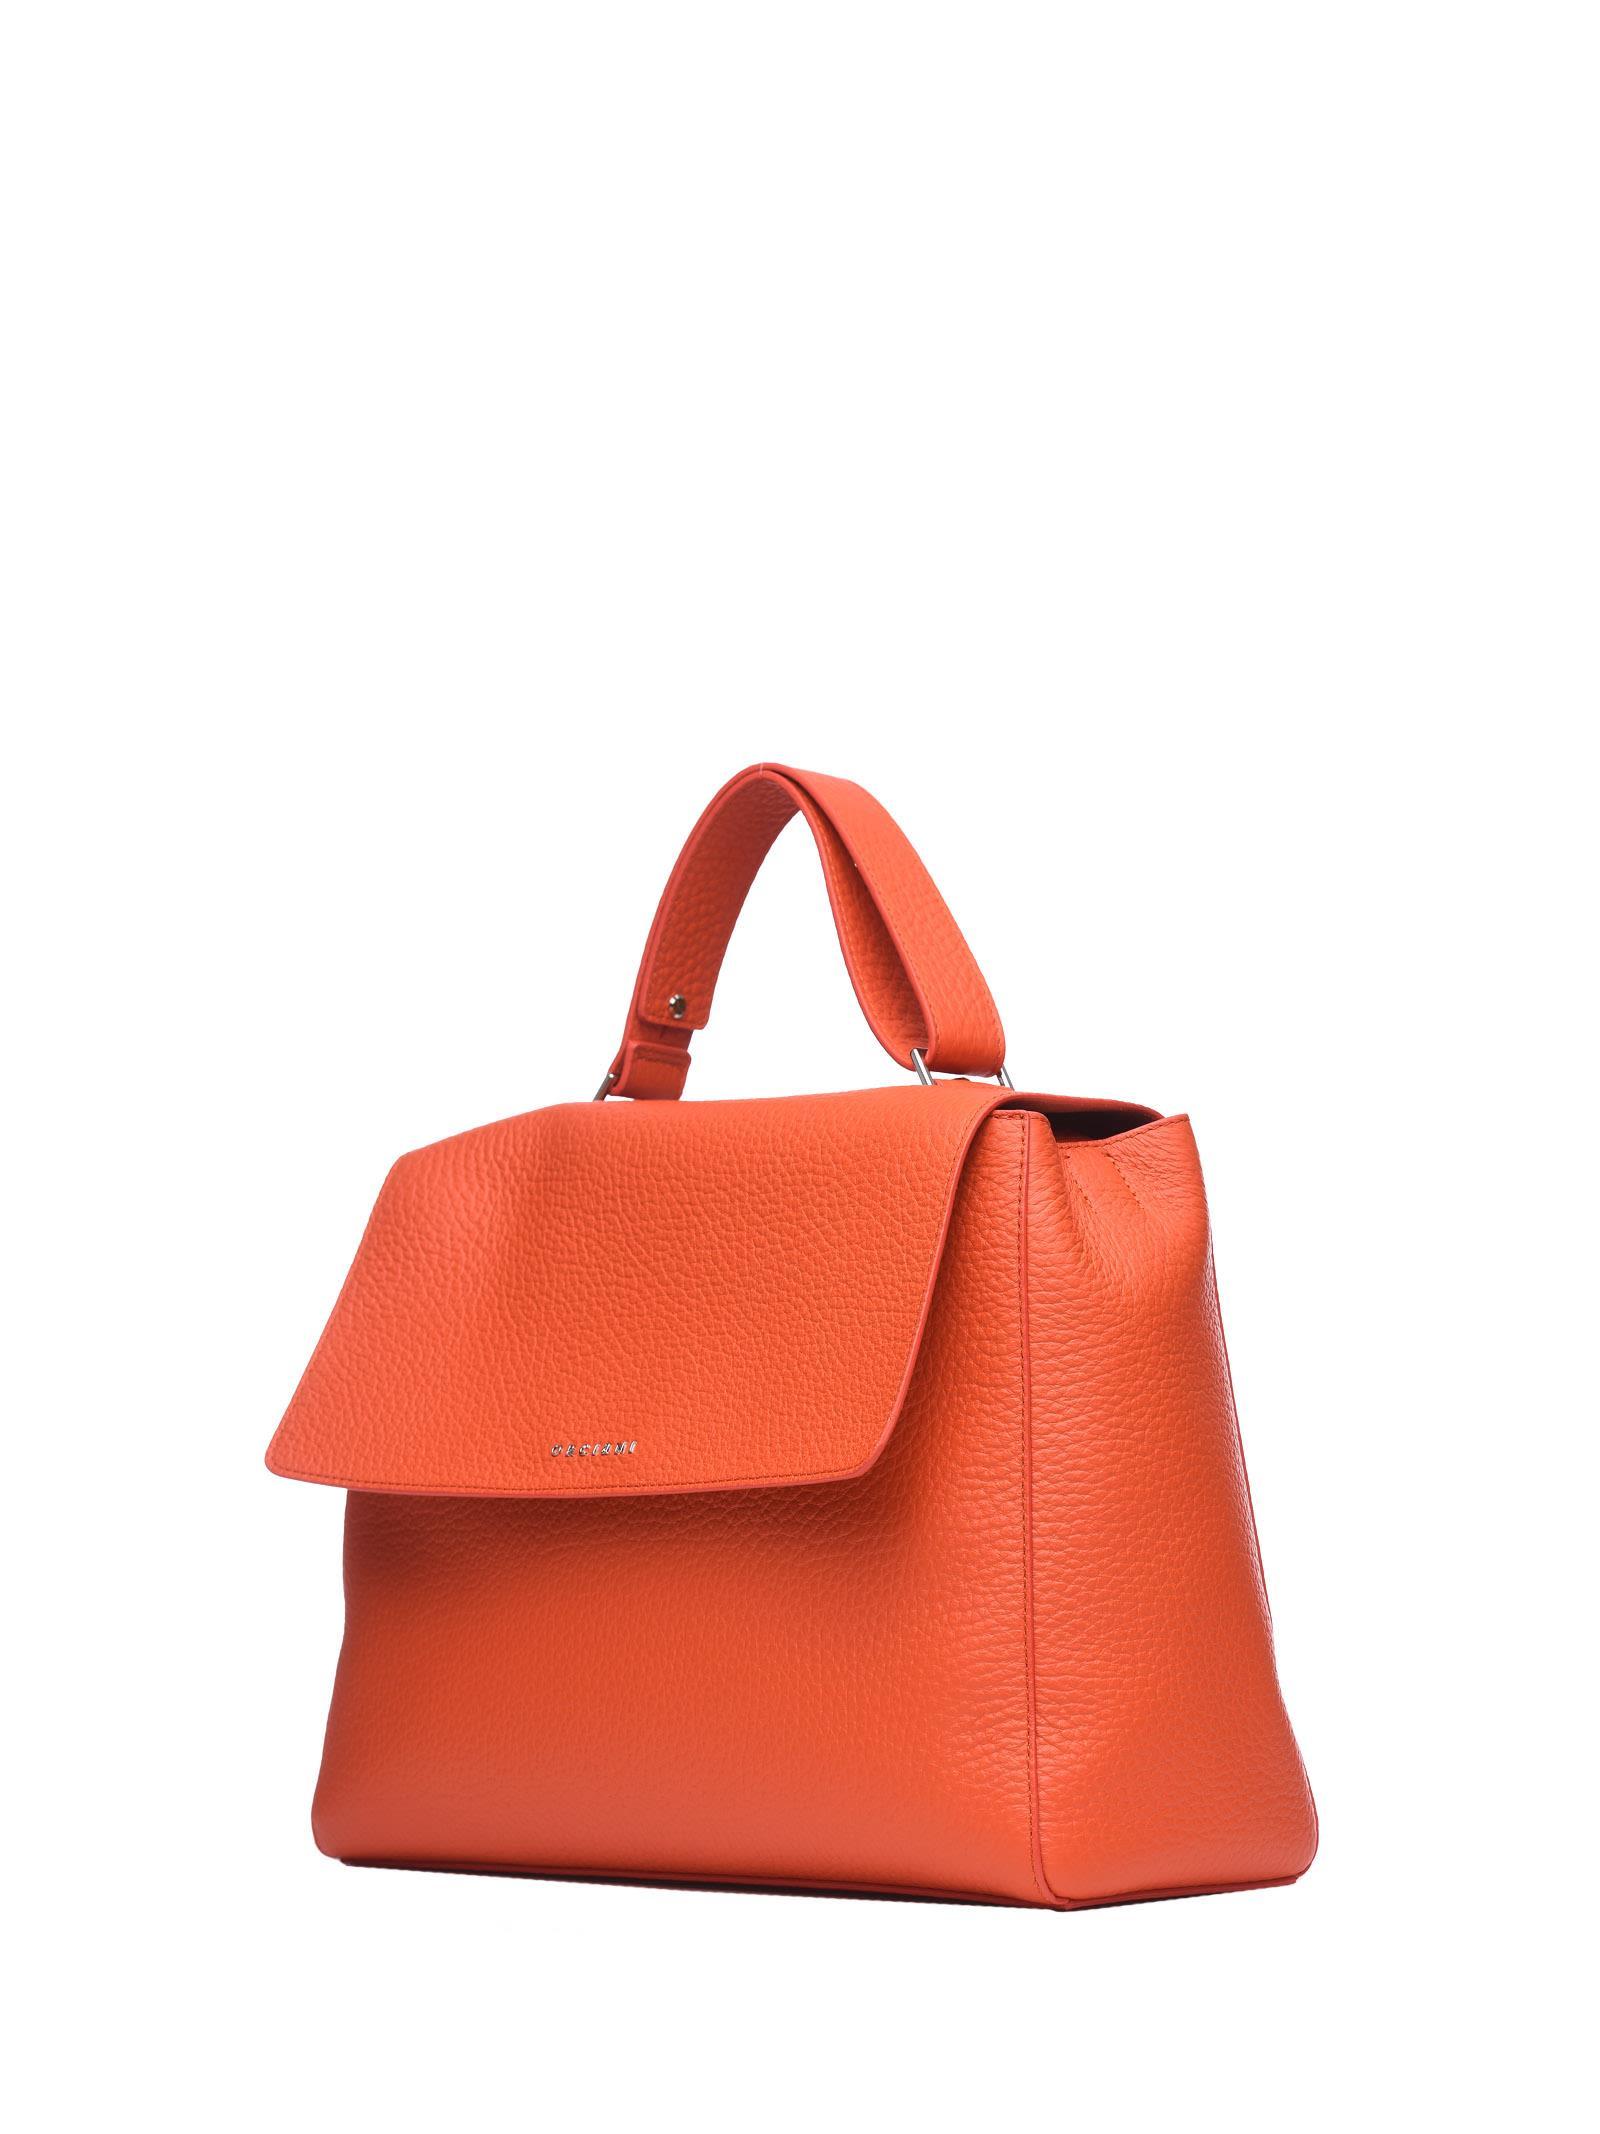 Shoulder Bag for Women On Sale, Orange, Leather, 2017, one size Orciani